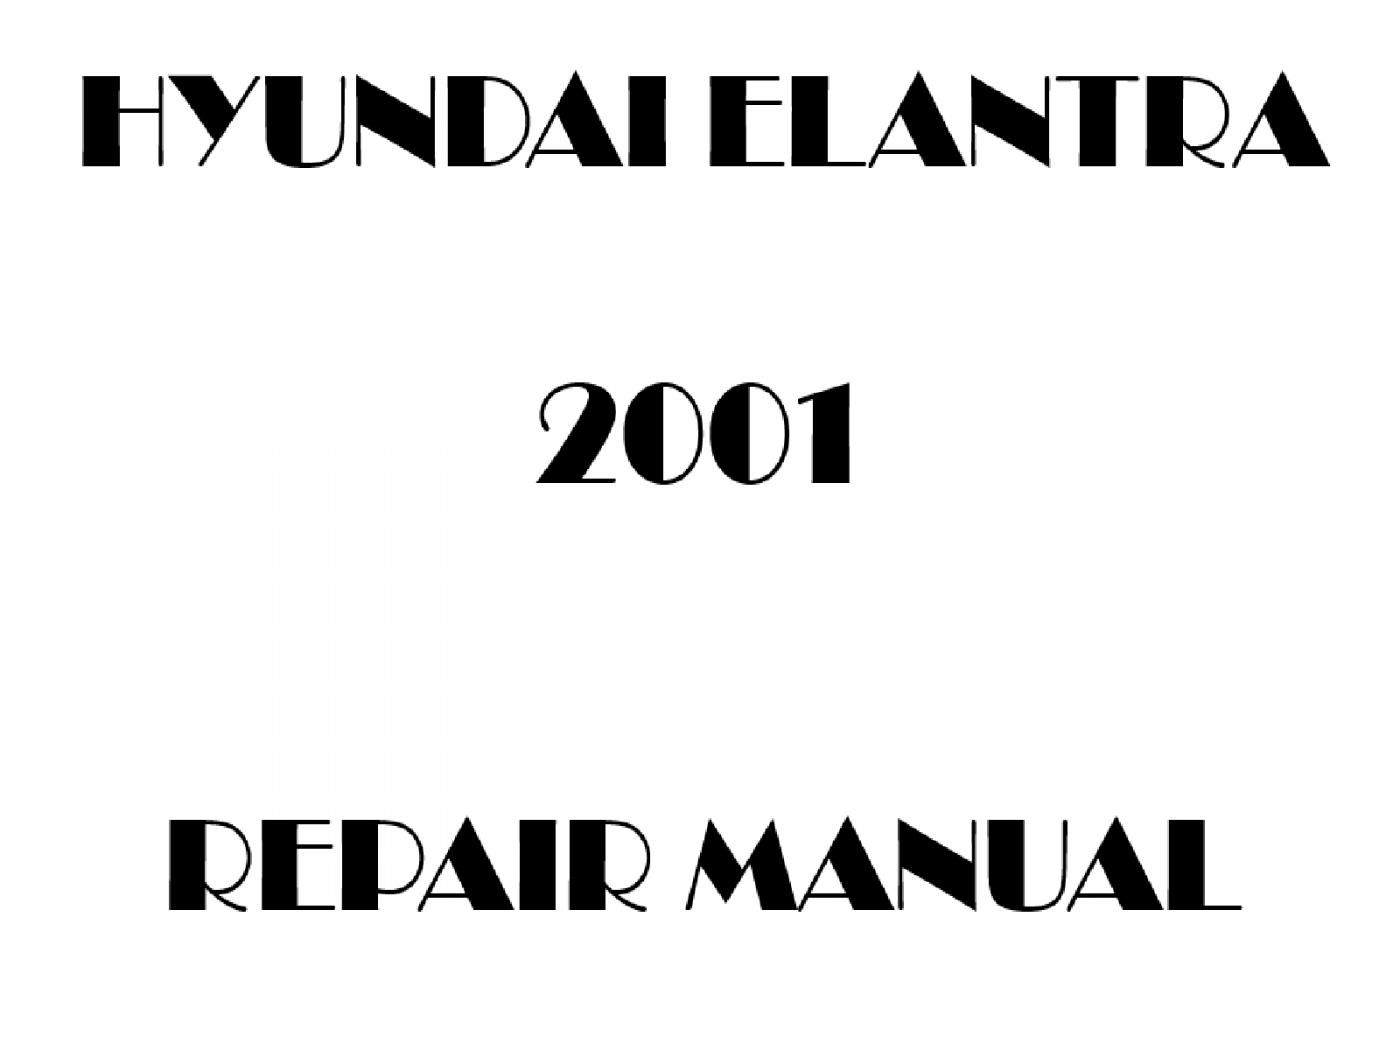 2001 Hyundai Elantra repair manual